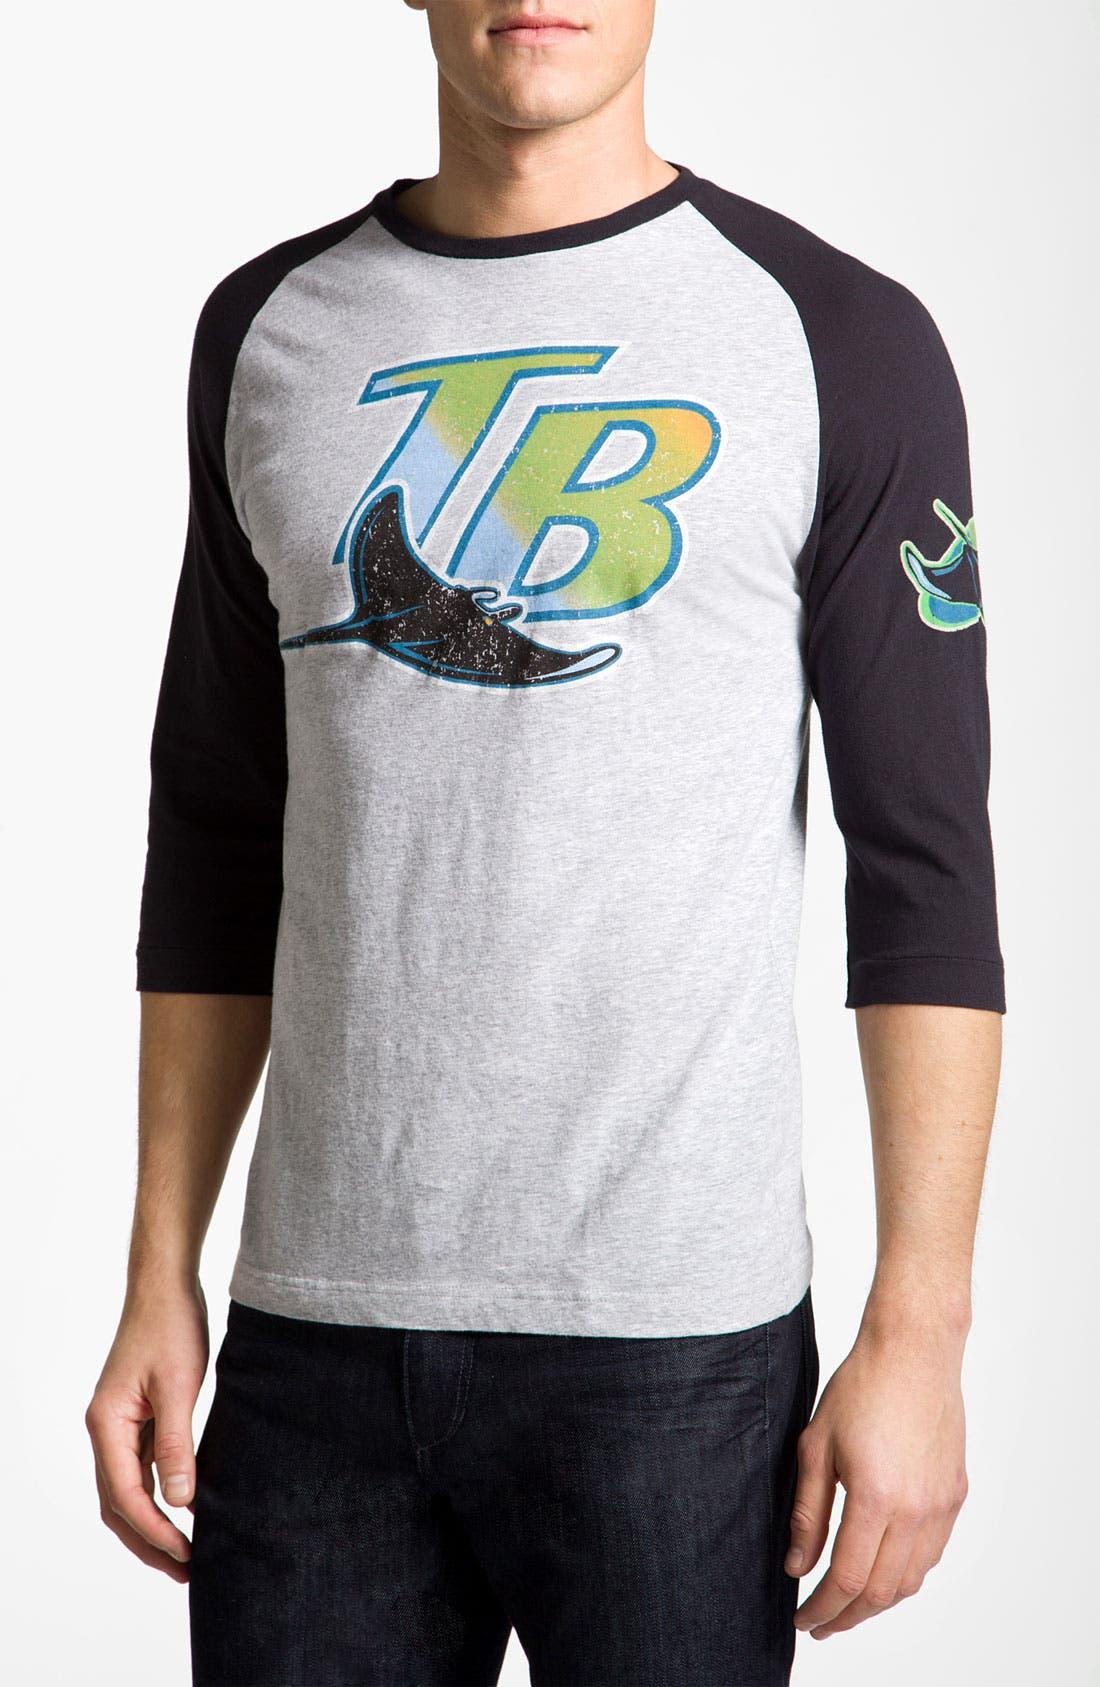 Alternate Image 1 Selected - Wright & Ditson 'Tampa Bay Rays' Baseball T-Shirt